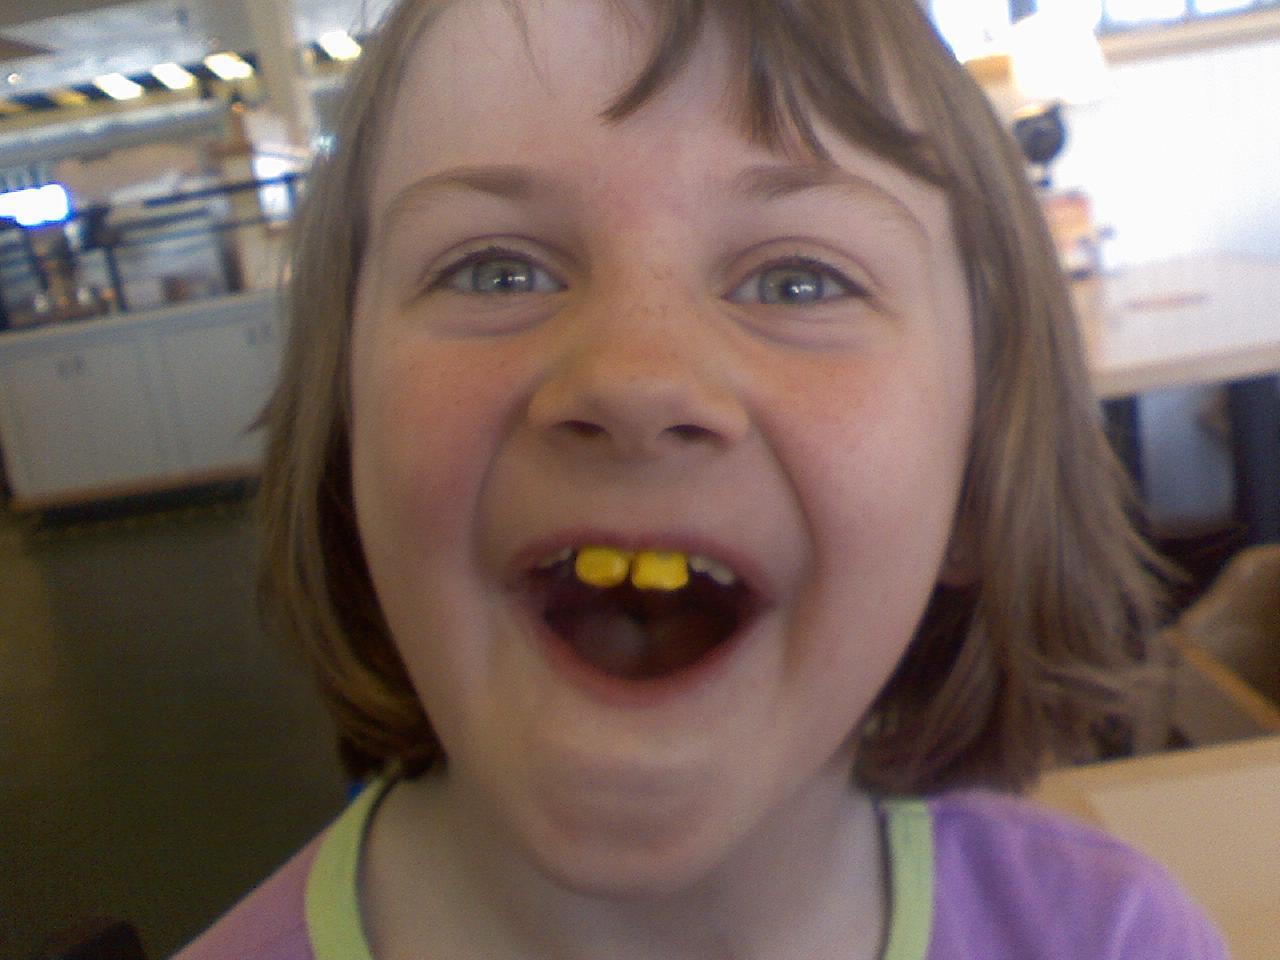 Yellow Teeth Girl Your Teeth Are Yellow